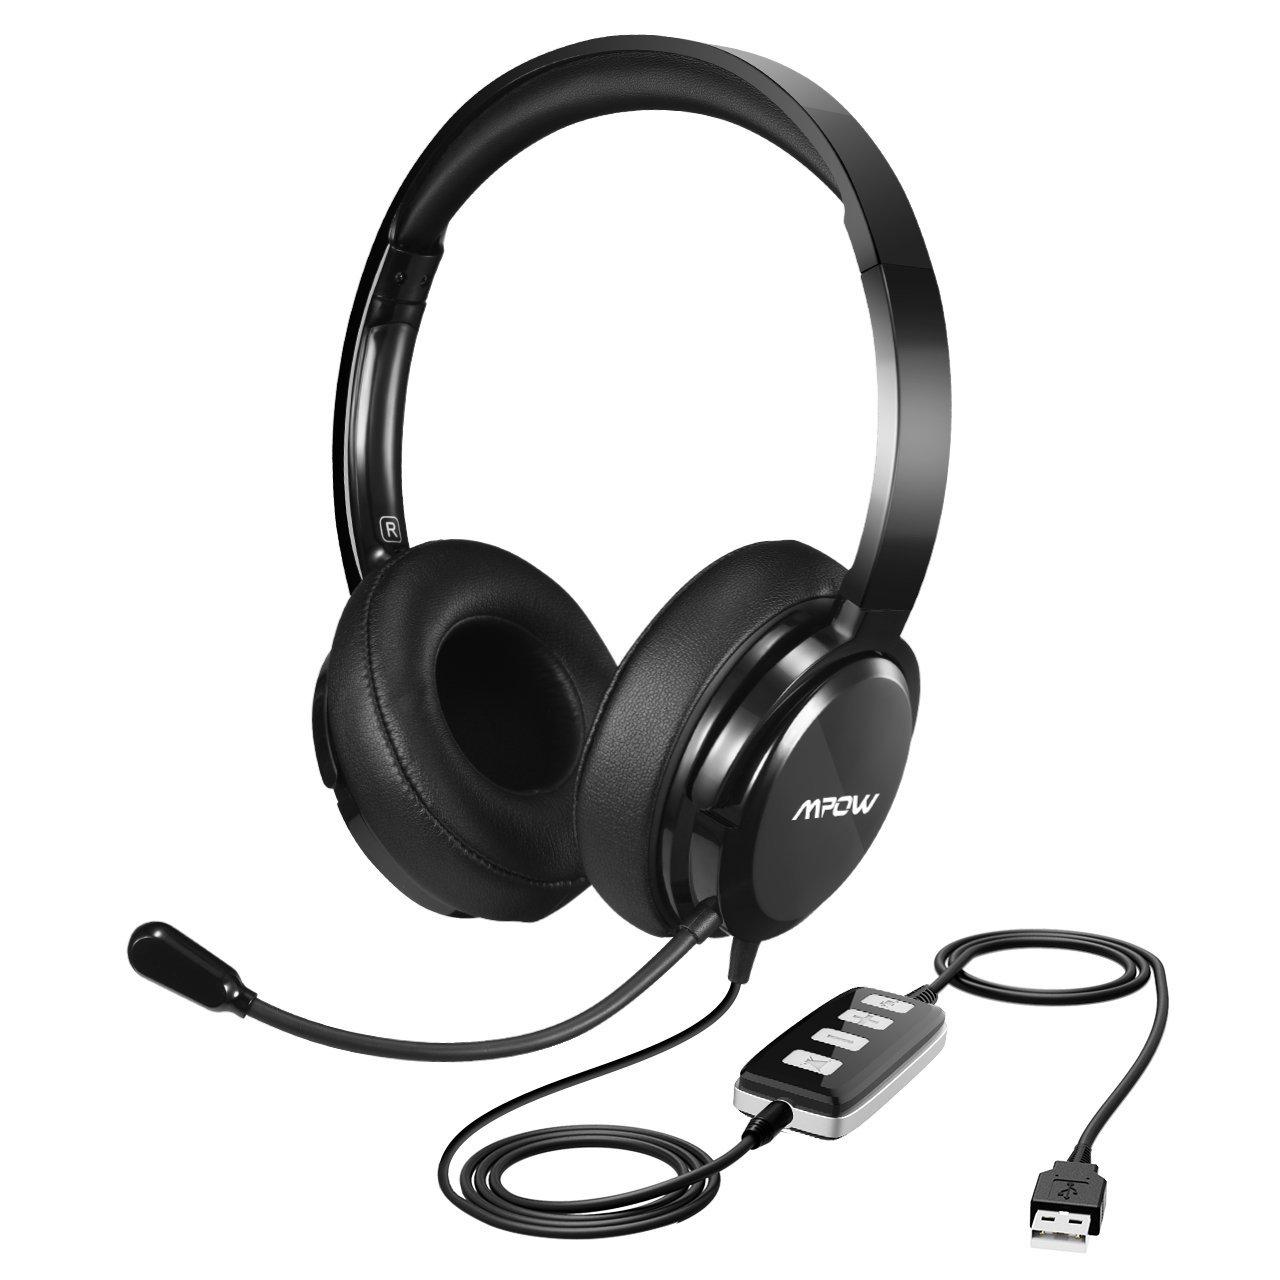 MPOW USB Skype headset